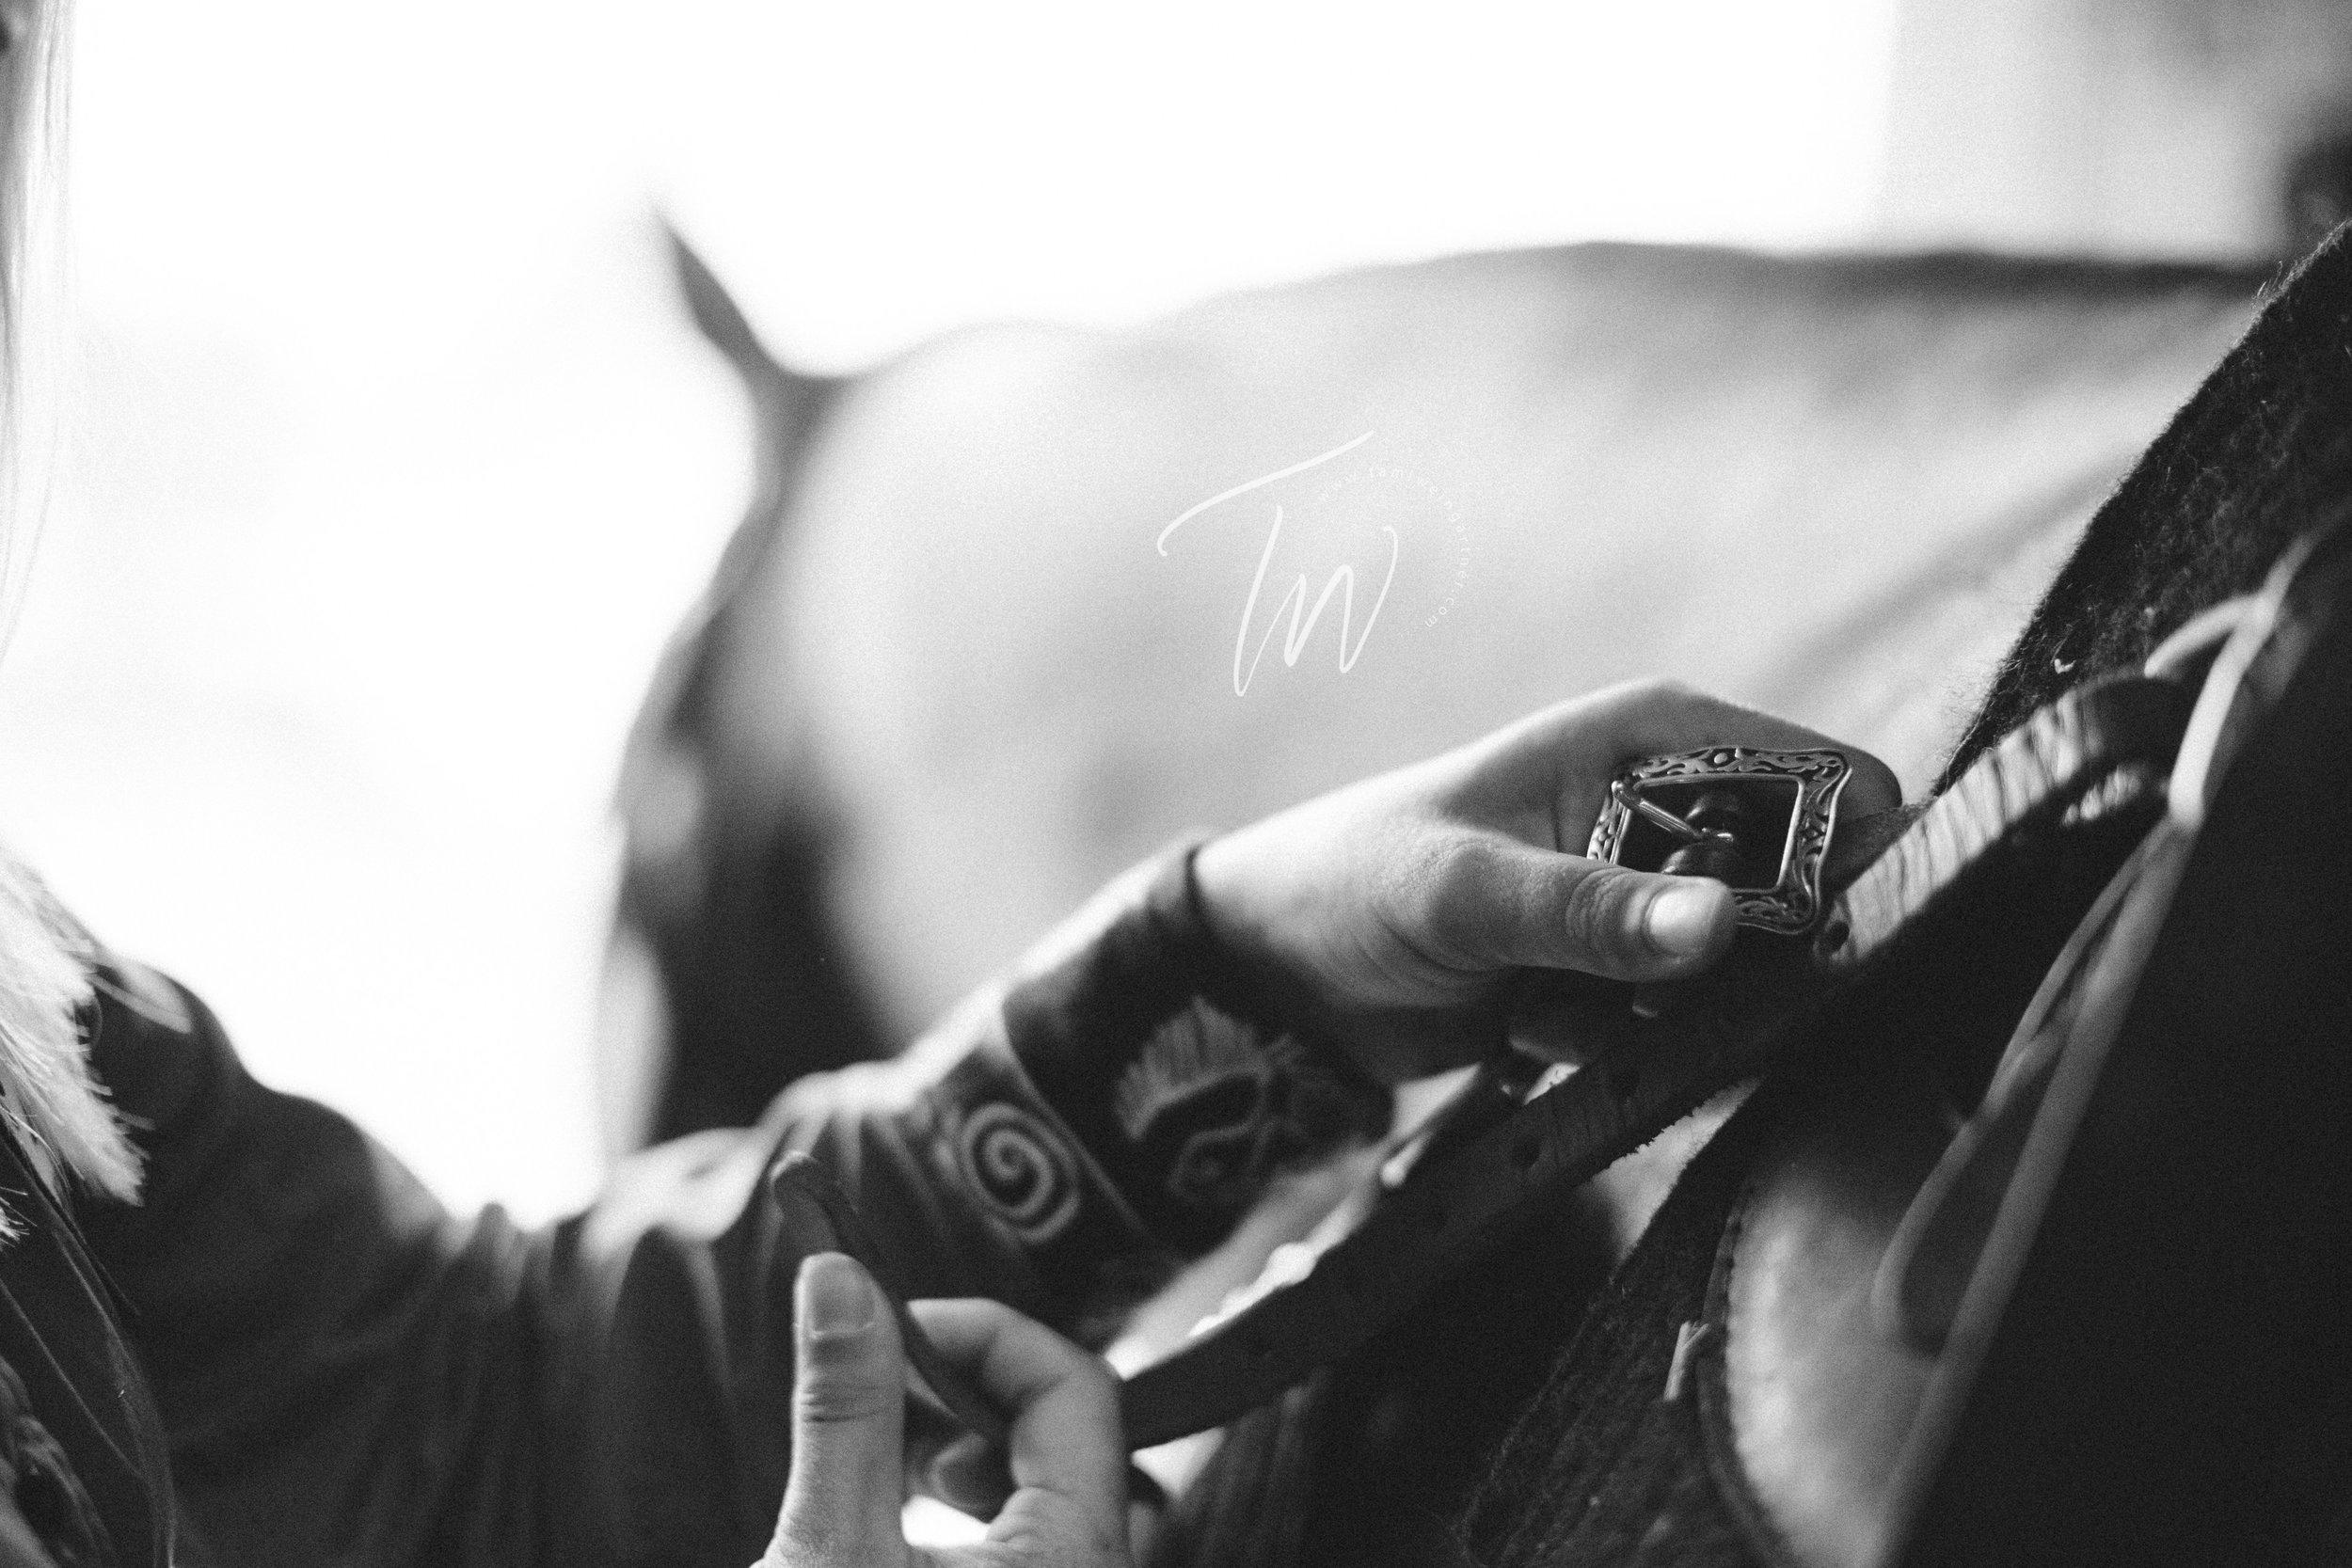 Breast collar buckle up on barrel saddle.